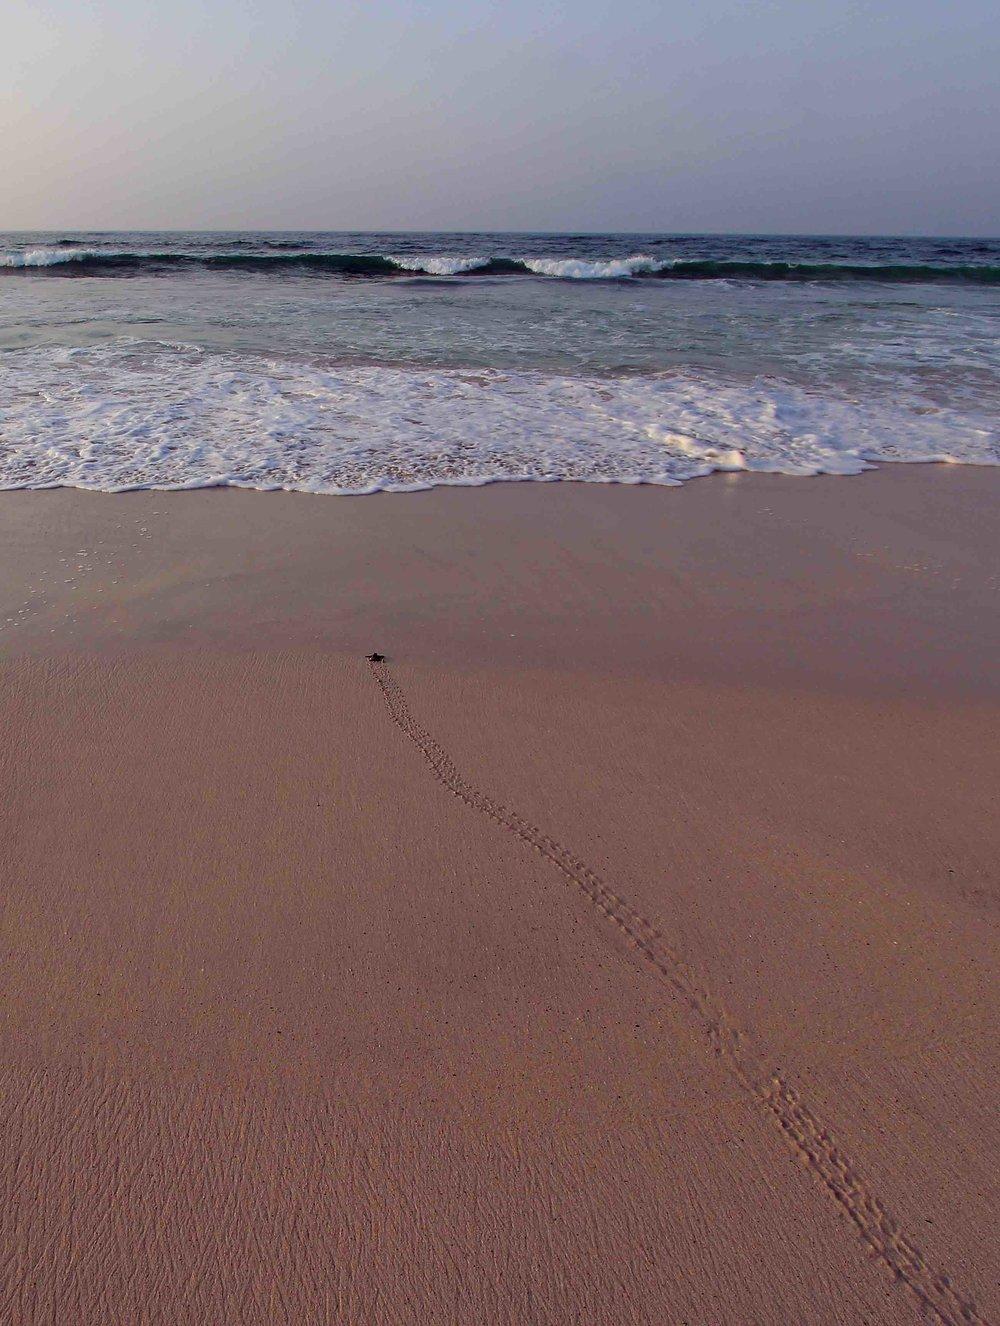 A loggerhead hatchling crawls toward the sea in Oman. © JÉRÔME BOURJEA;